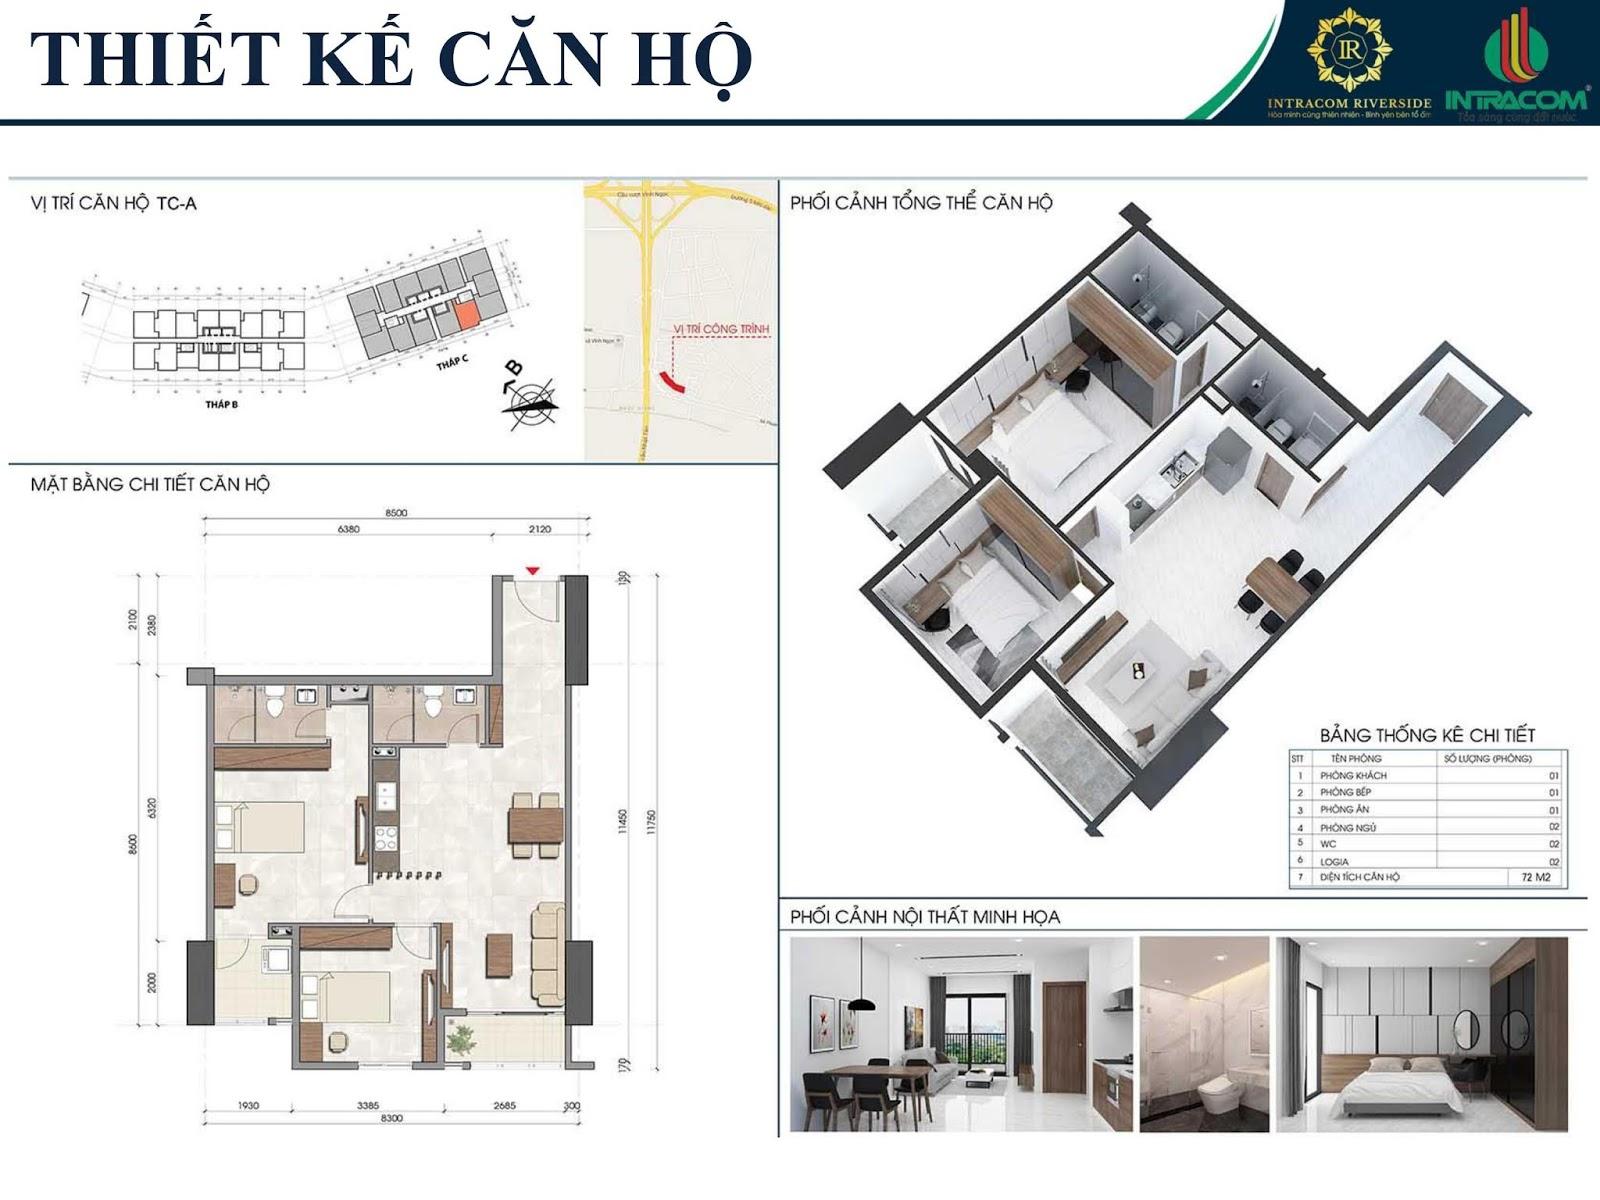 Thiết kế căn 09 - 12 - 72m2